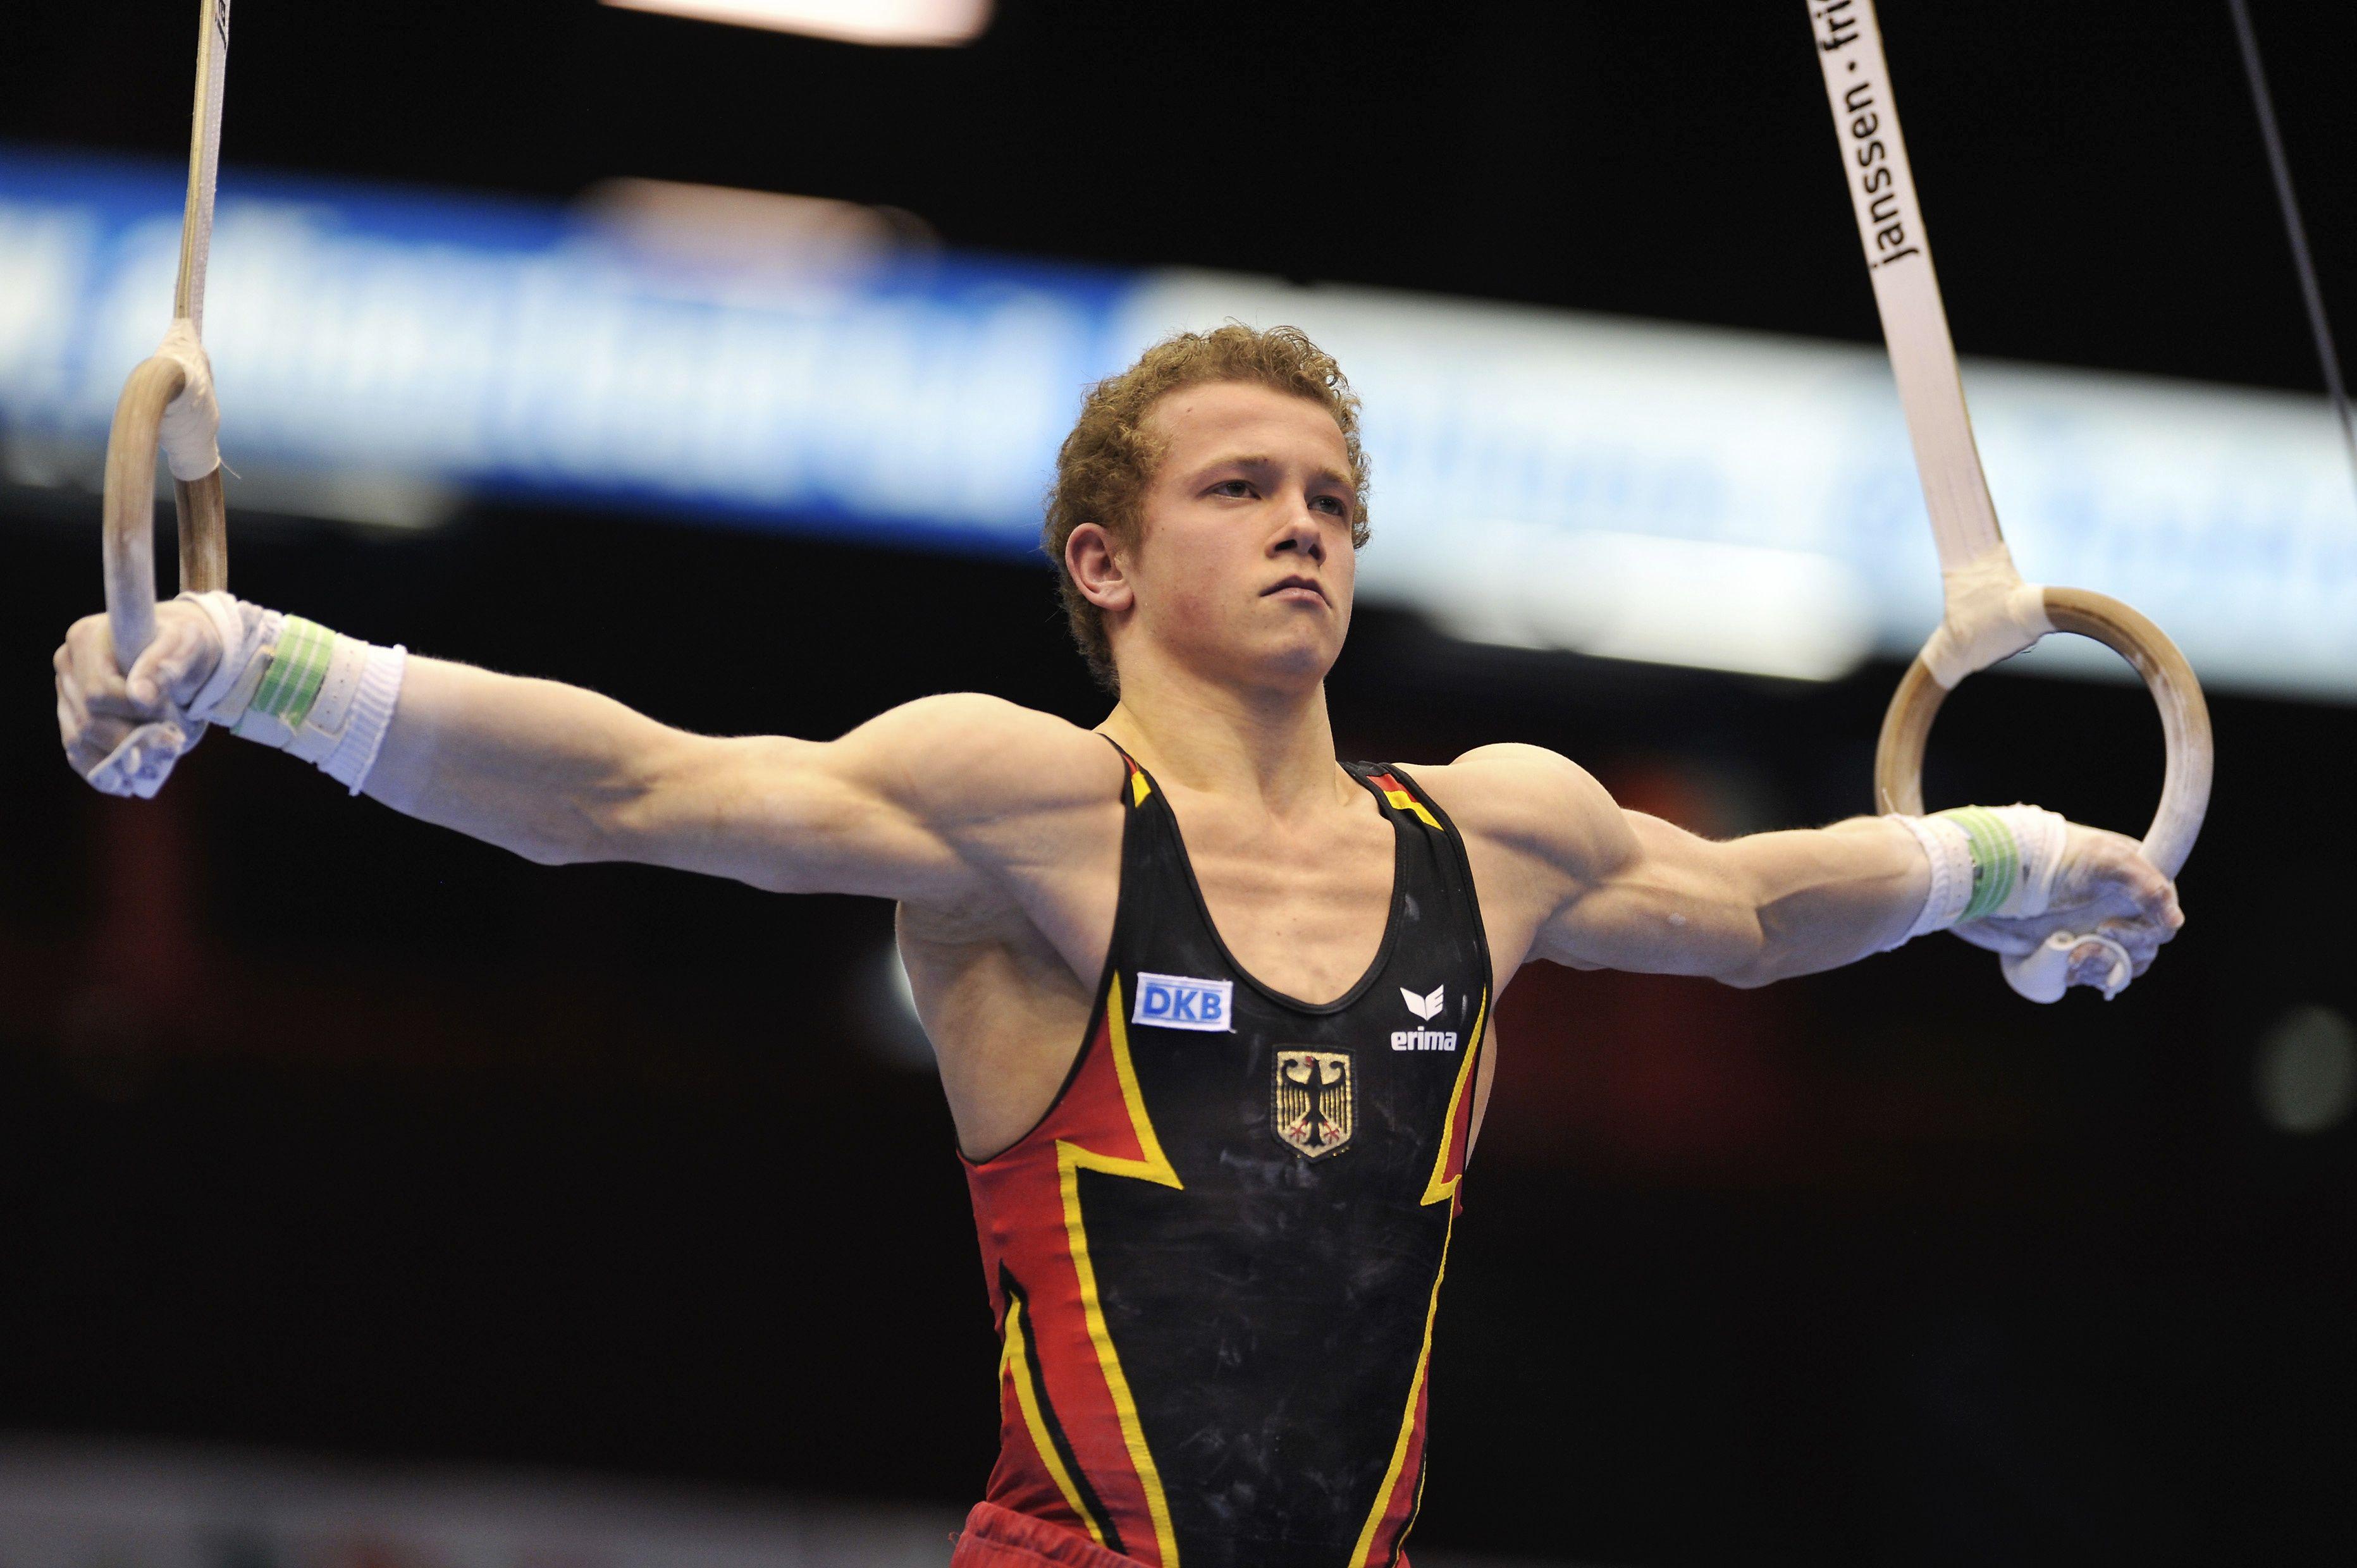 Fabian Hambüchen Olympia 2021